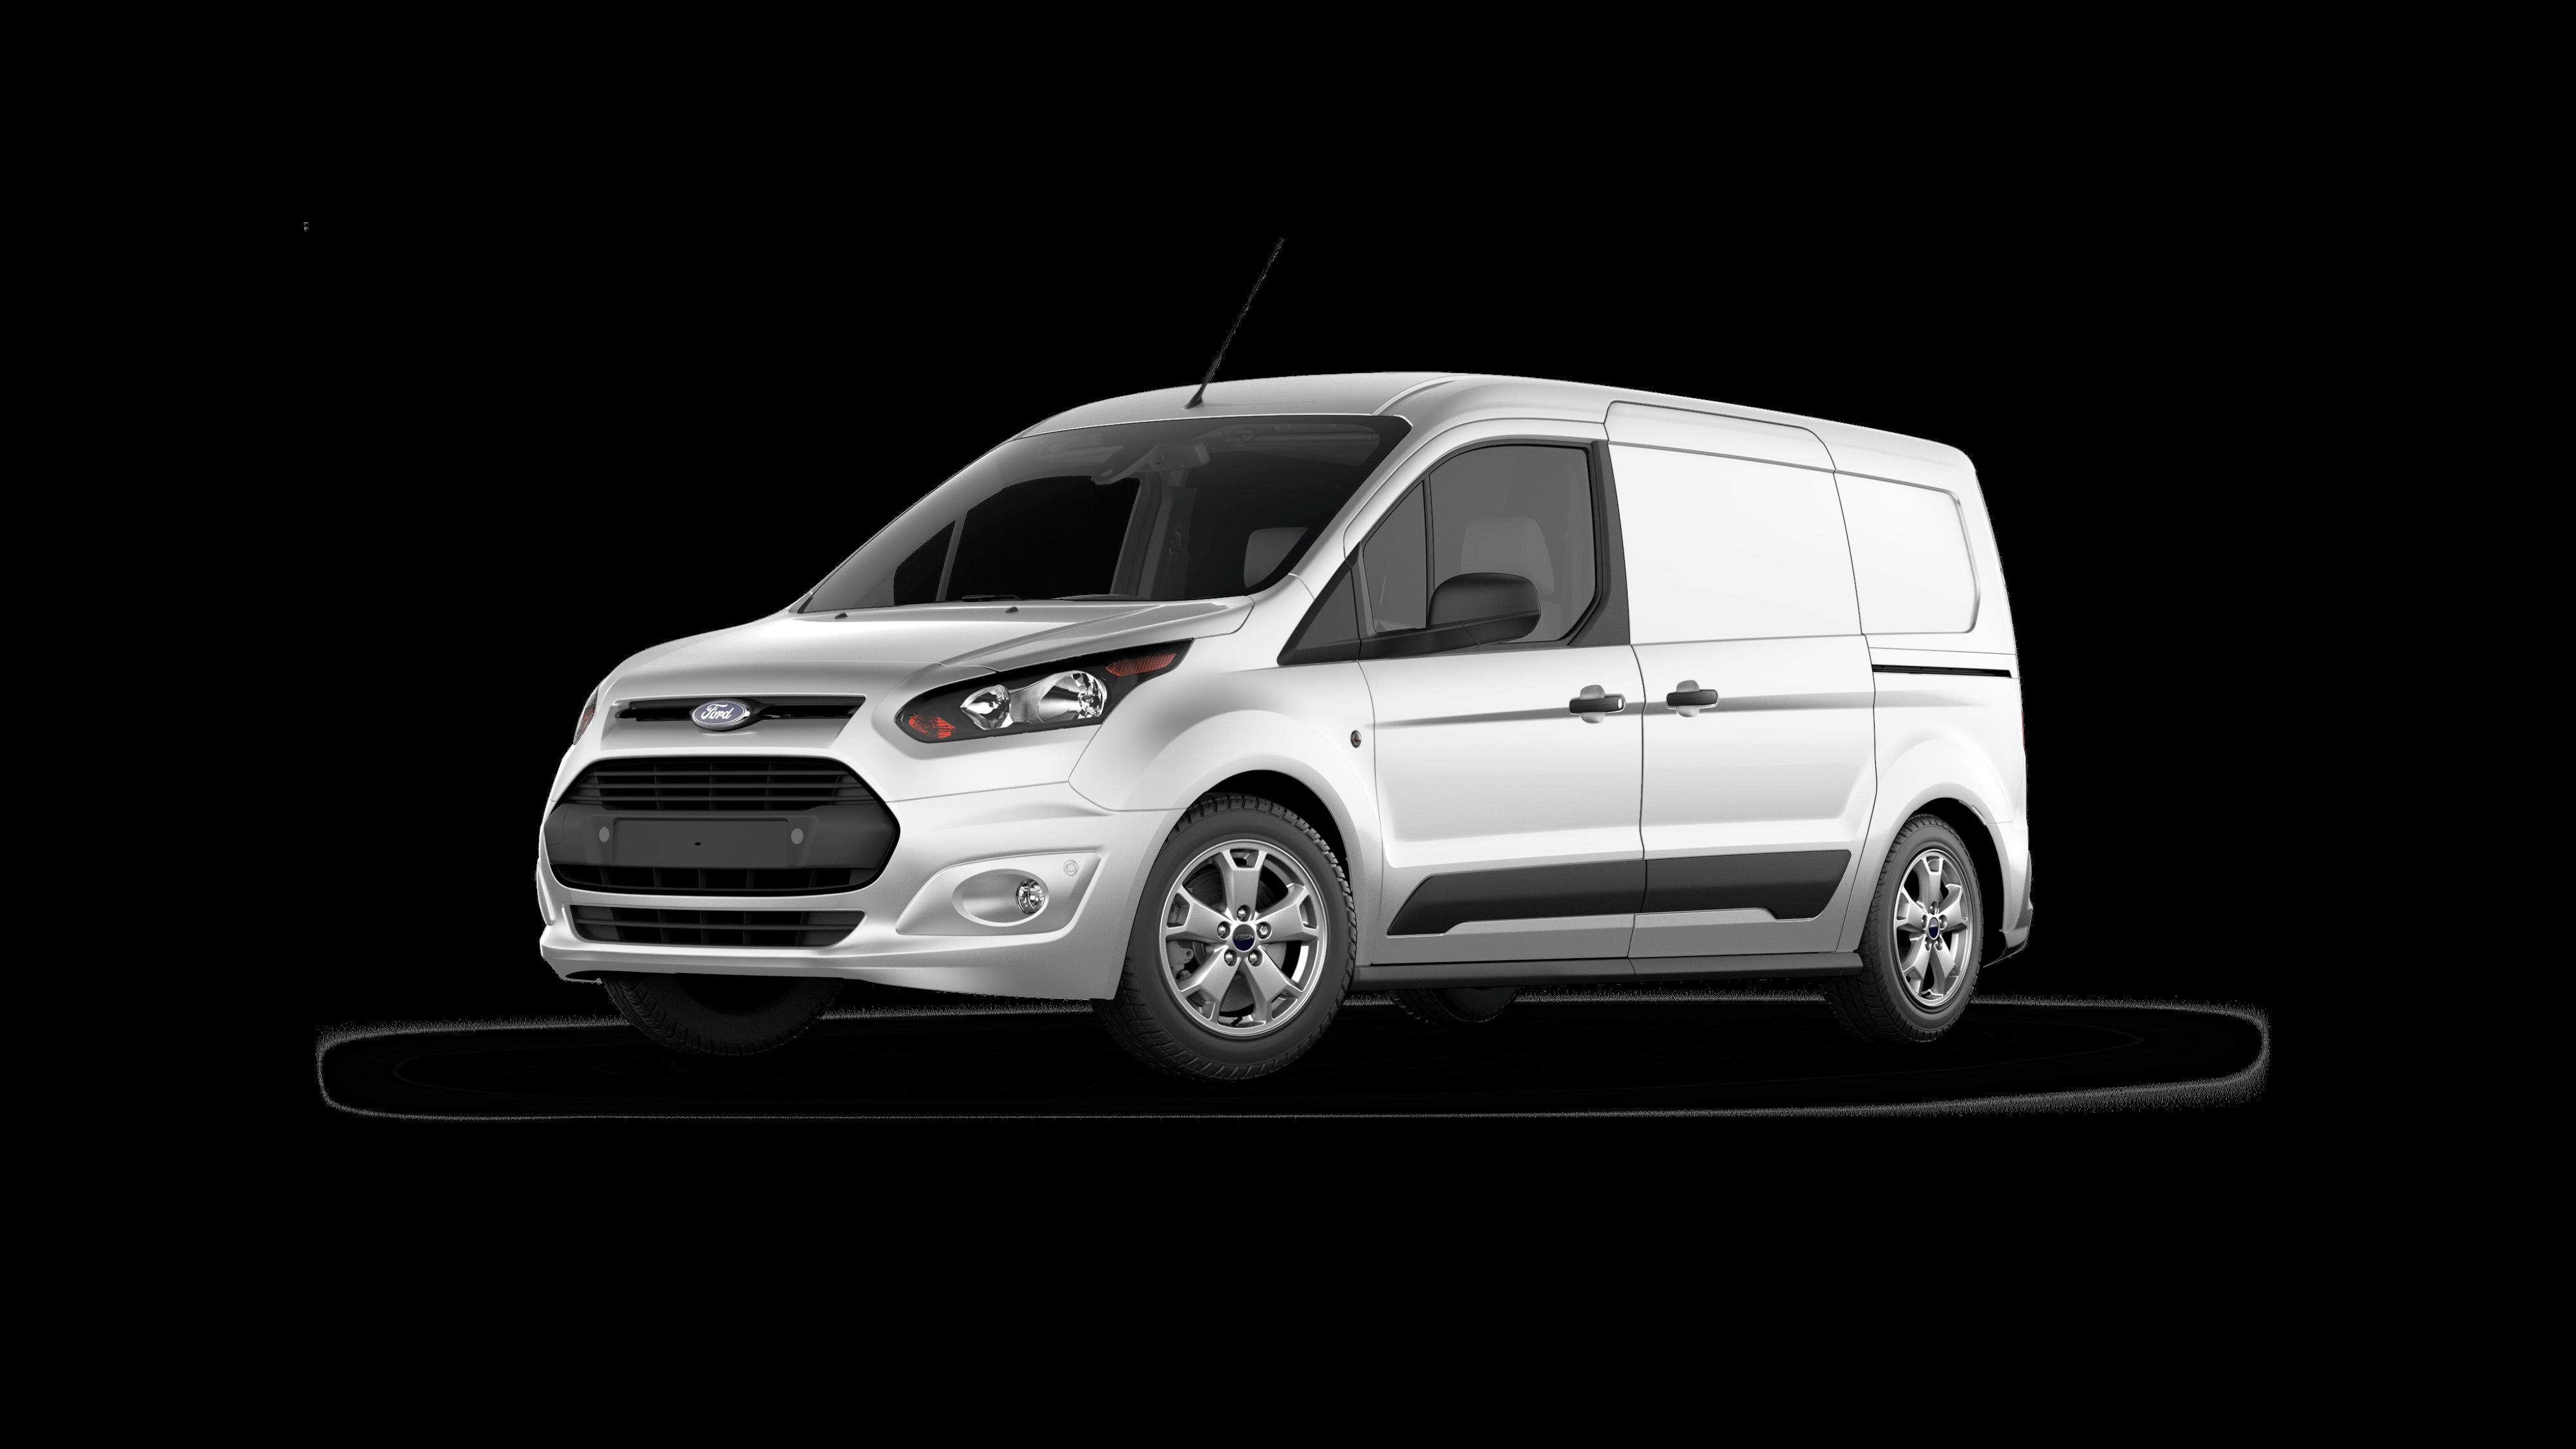 Middleton 2018 Vehicles for Sale